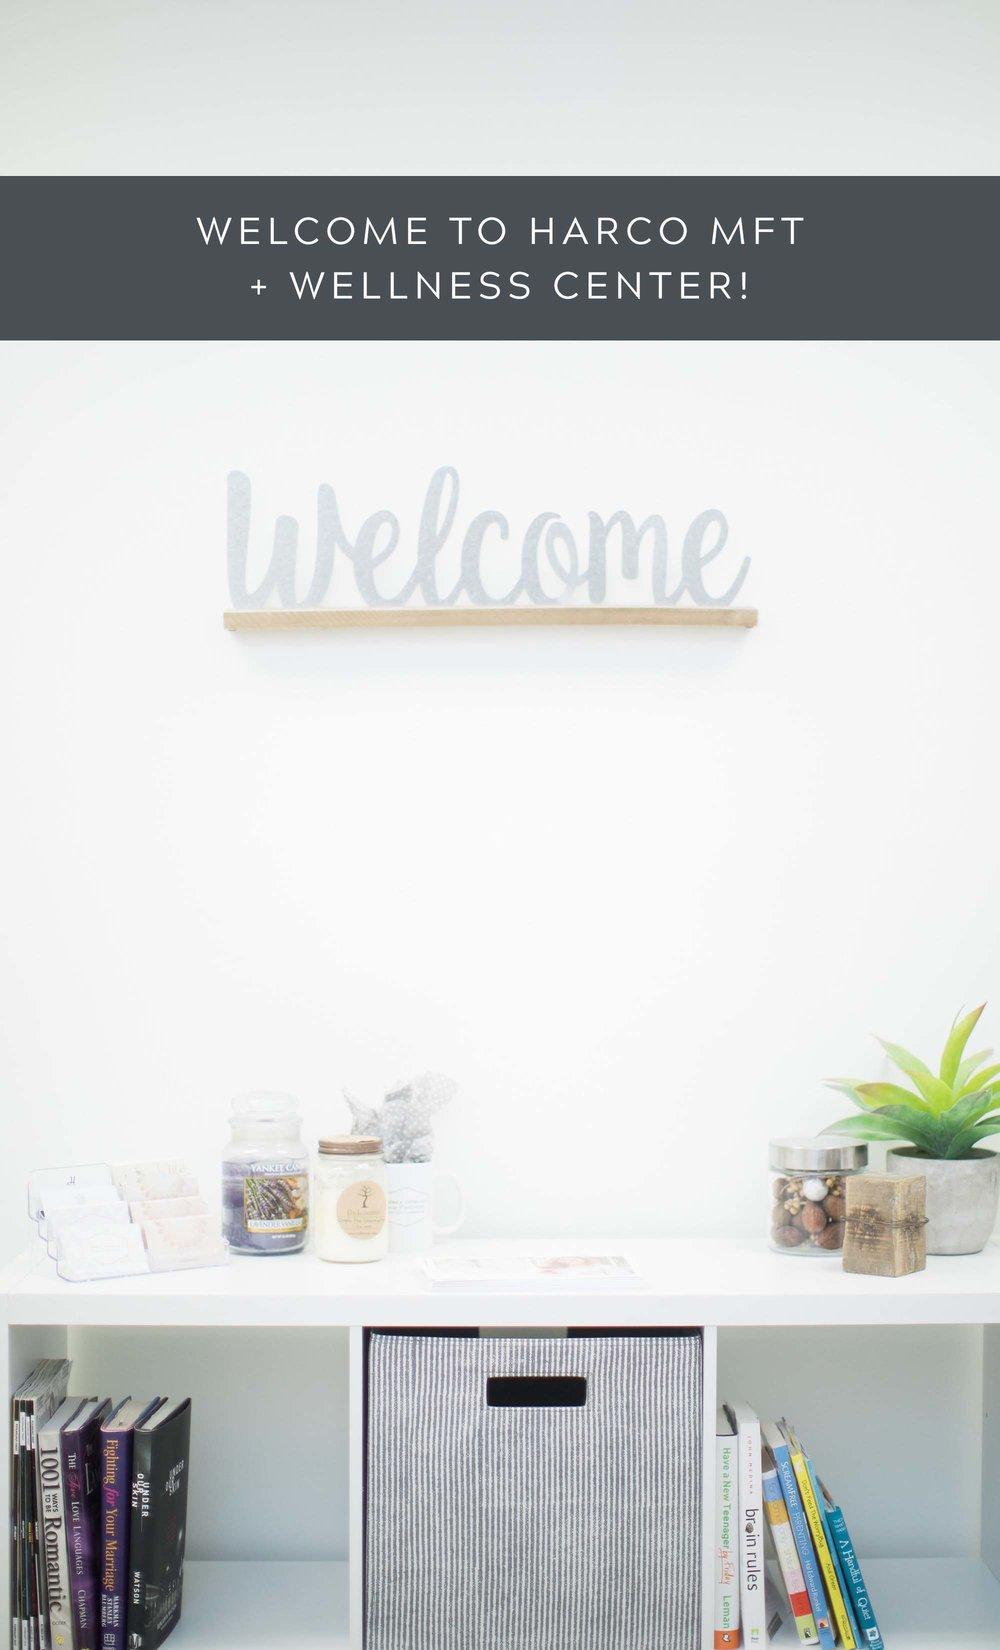 Welcome to HarCo MFT + Wellness Center